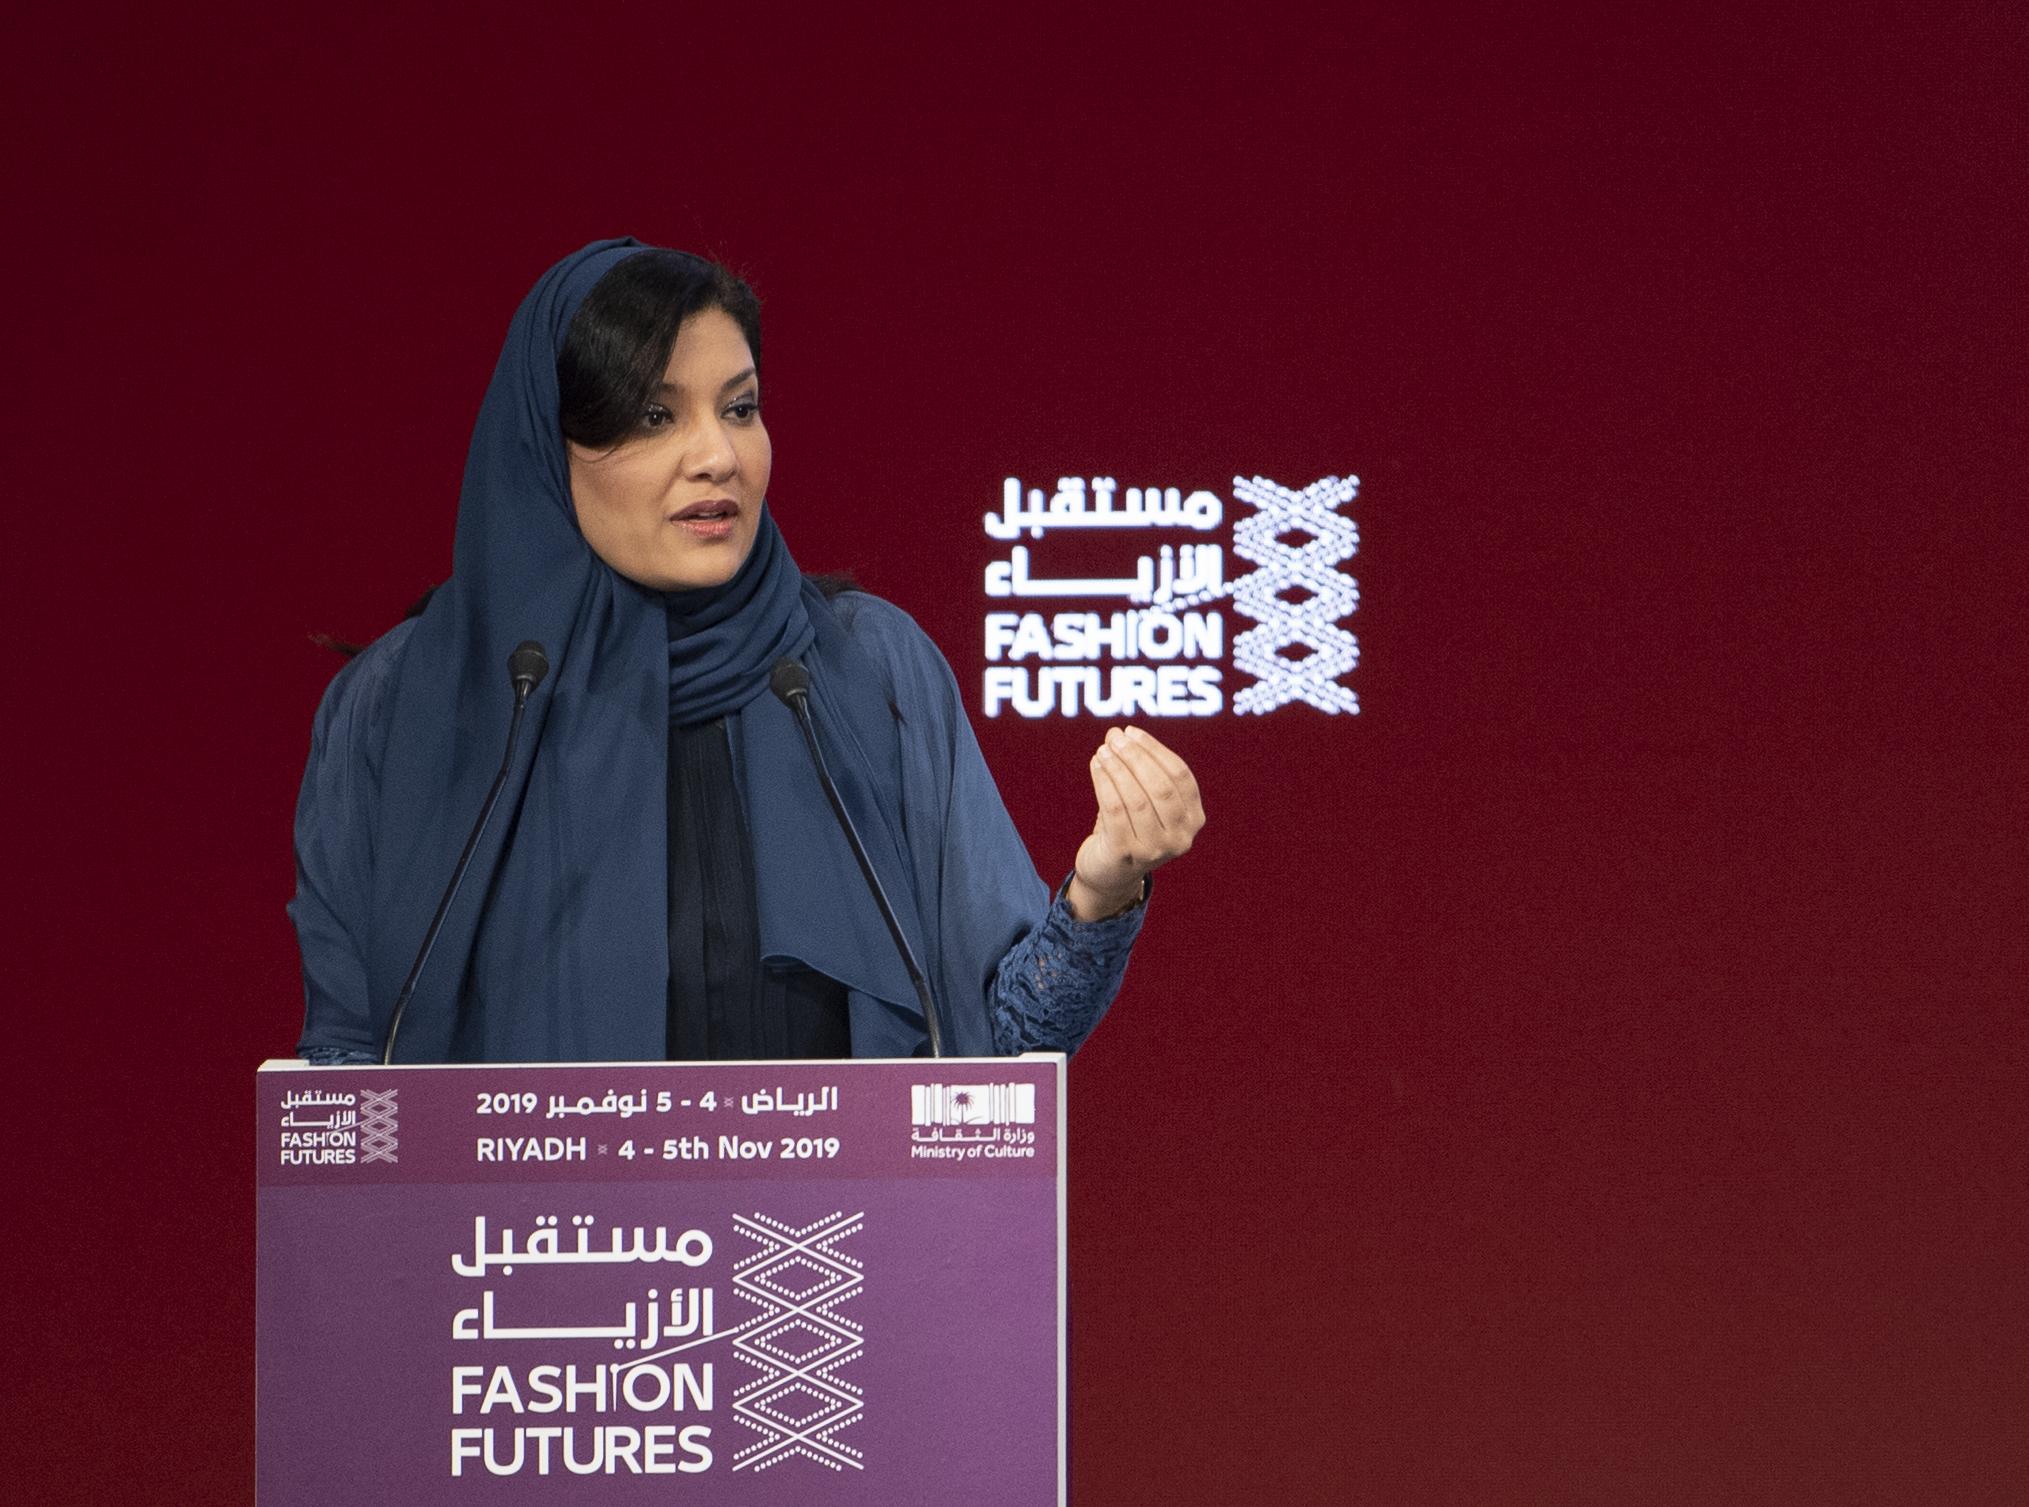 Princess Reema speaking at the inaugural Fashion Futures conference in Riyadh.